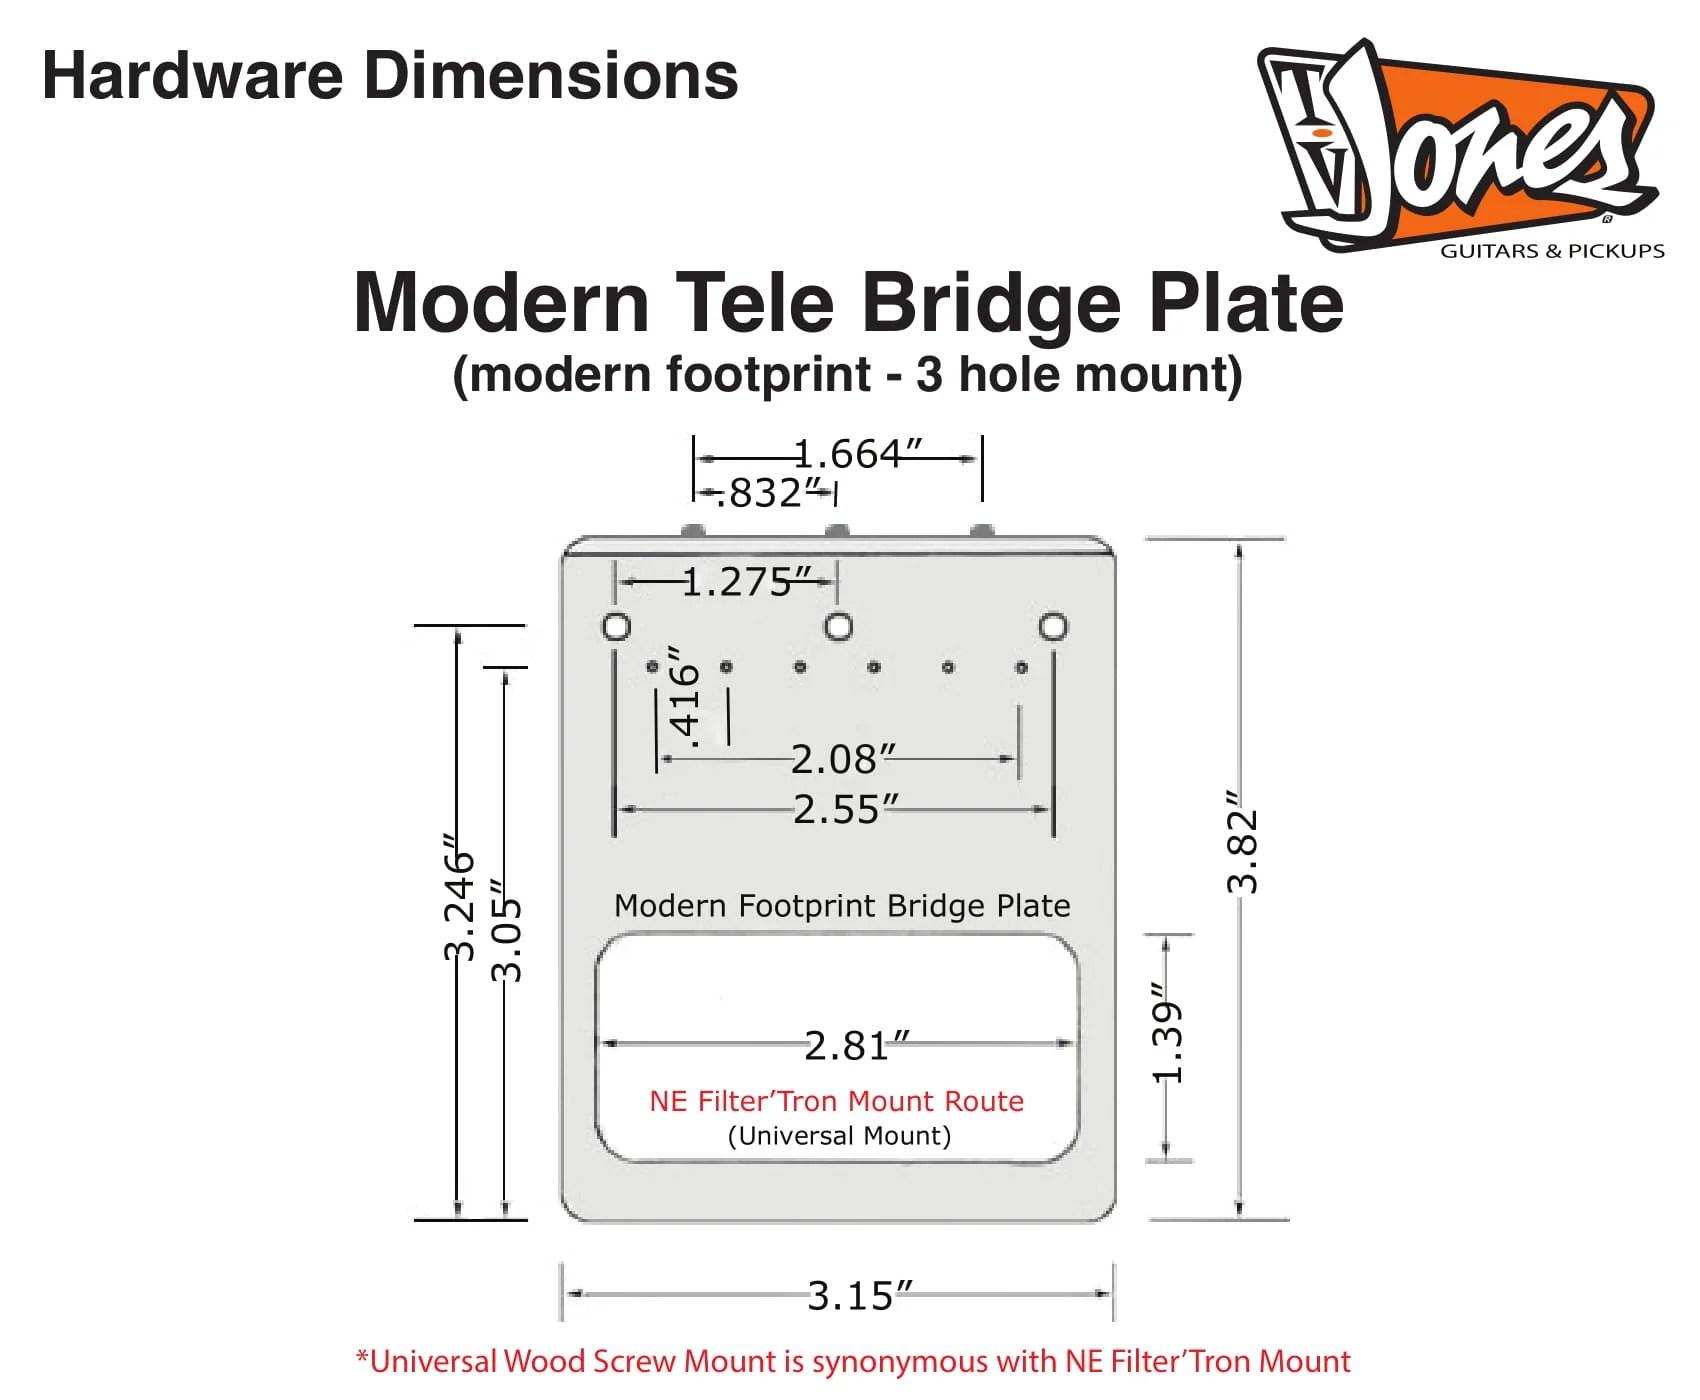 medium resolution of modern vs original the modern tele bridge plate mounts with 3 holes and the original tele bridge plate mounts with 4 holes